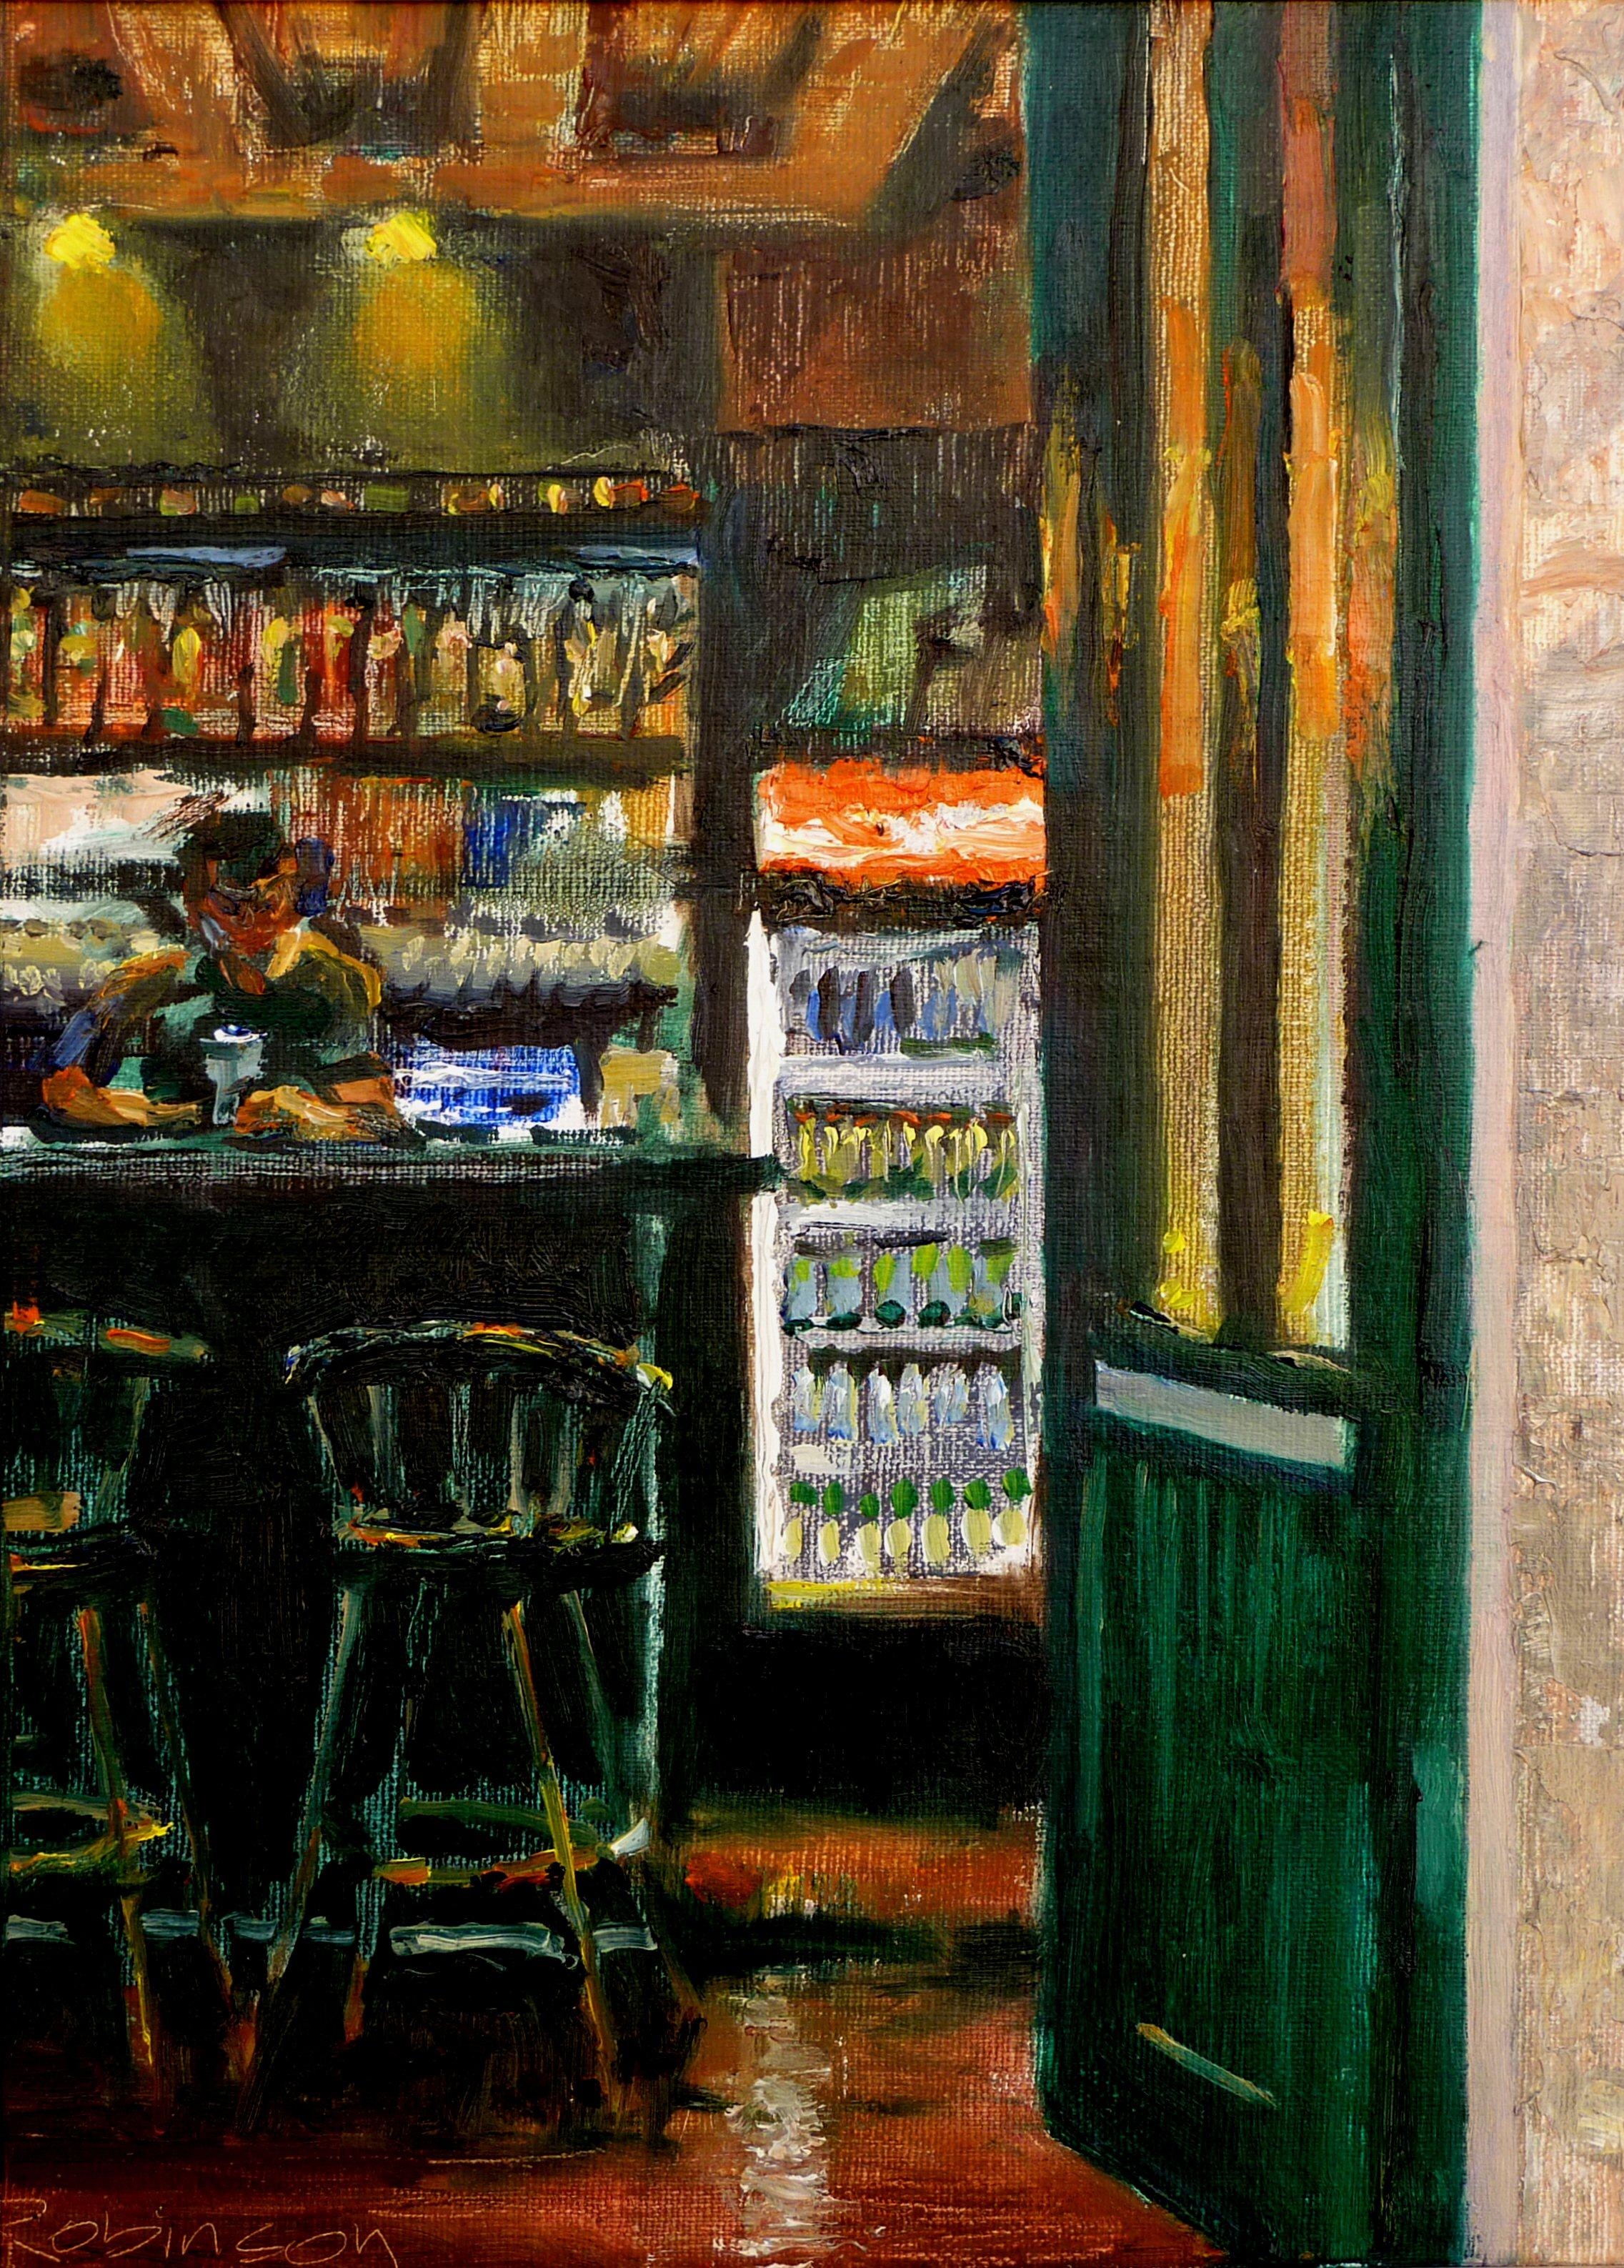 Dario's Bar